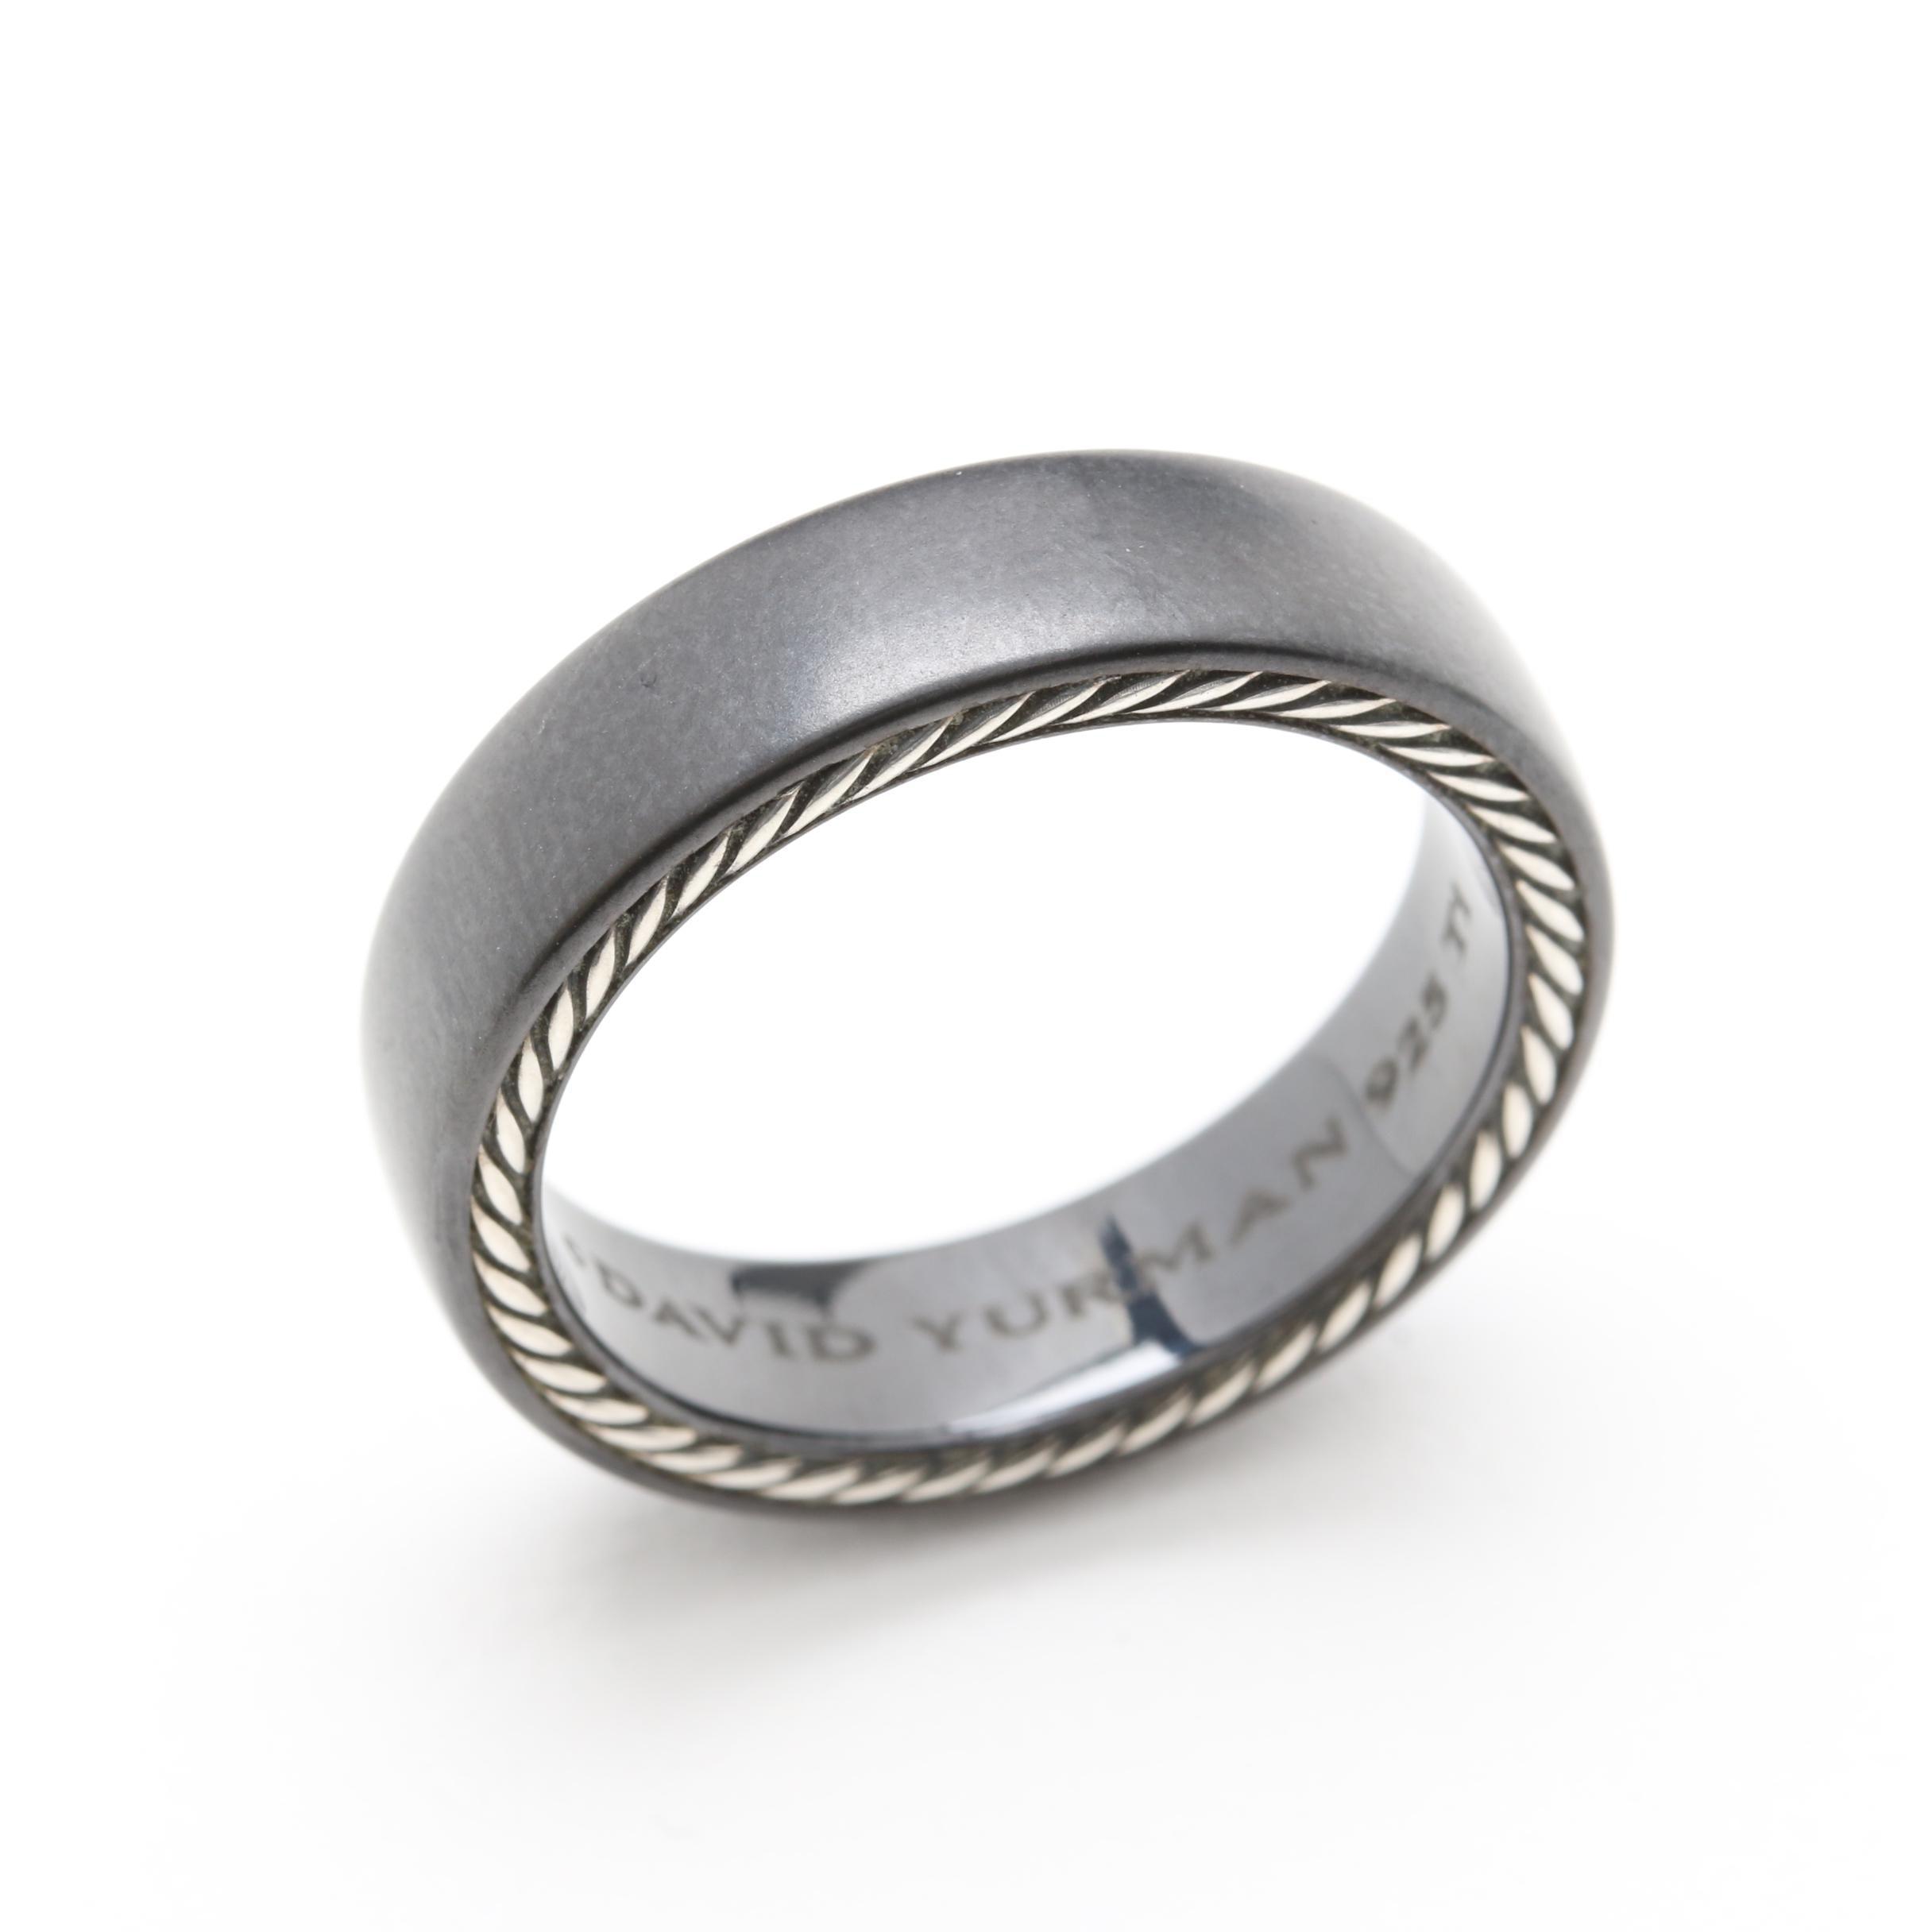 David Yurman Streamline Sterling Silver and Titanium Ring